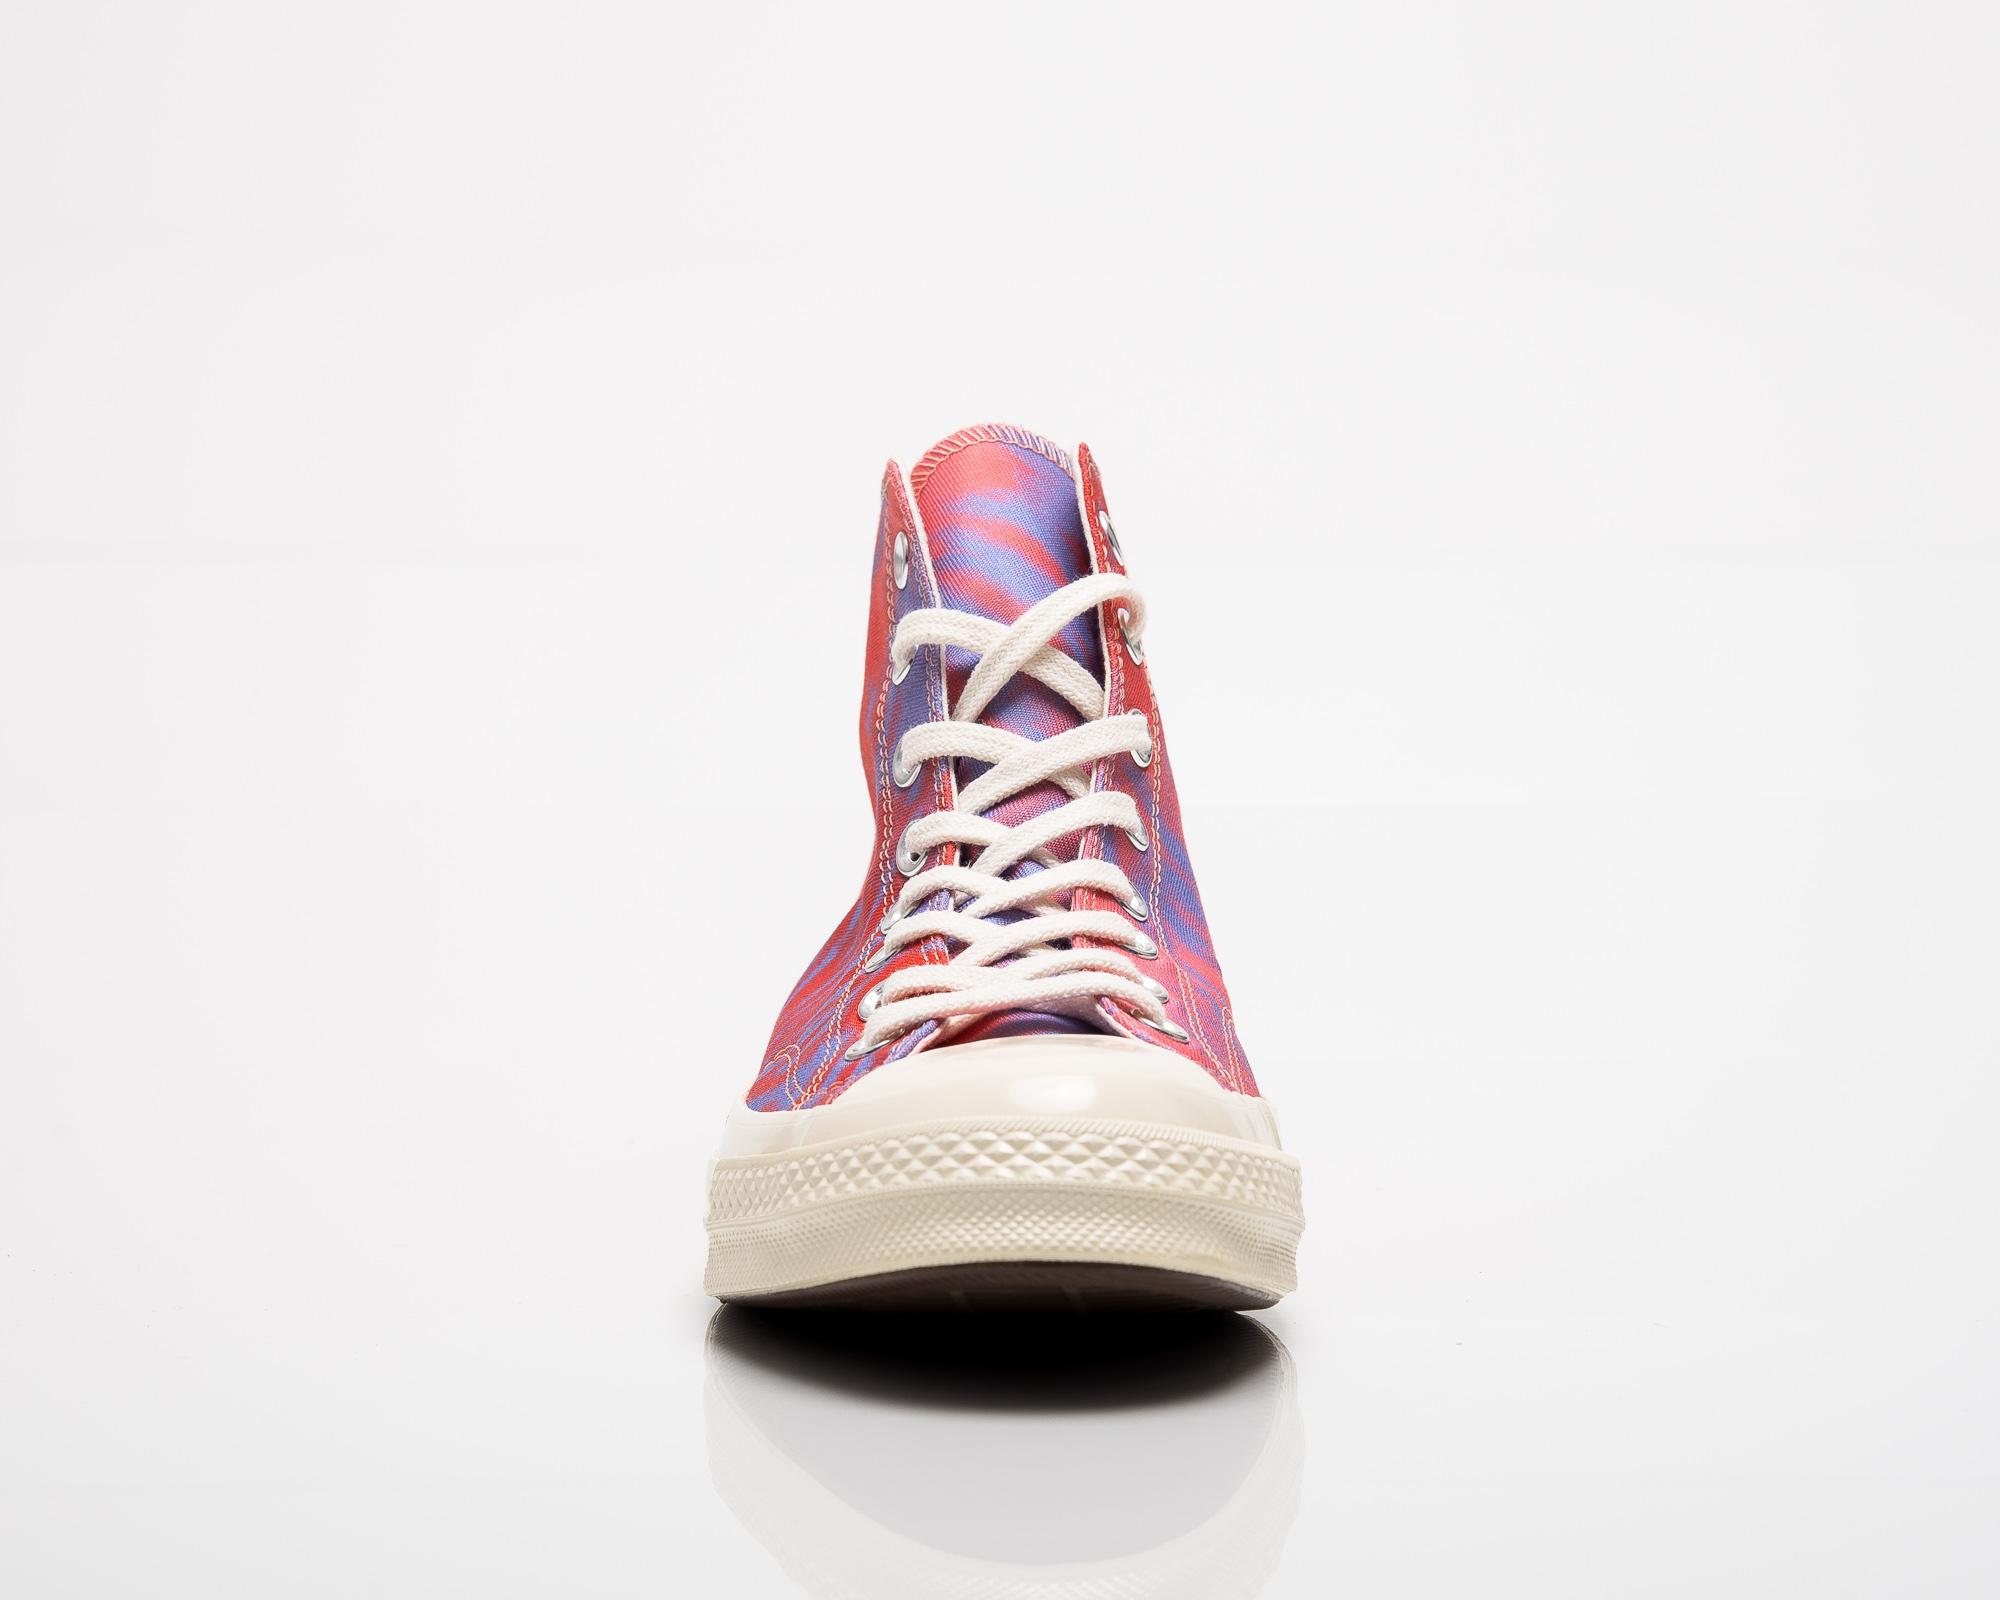 bae33635148d Converse All-Star Chuck Taylor  70 Tie Dye Hi - Shoes Casual ...